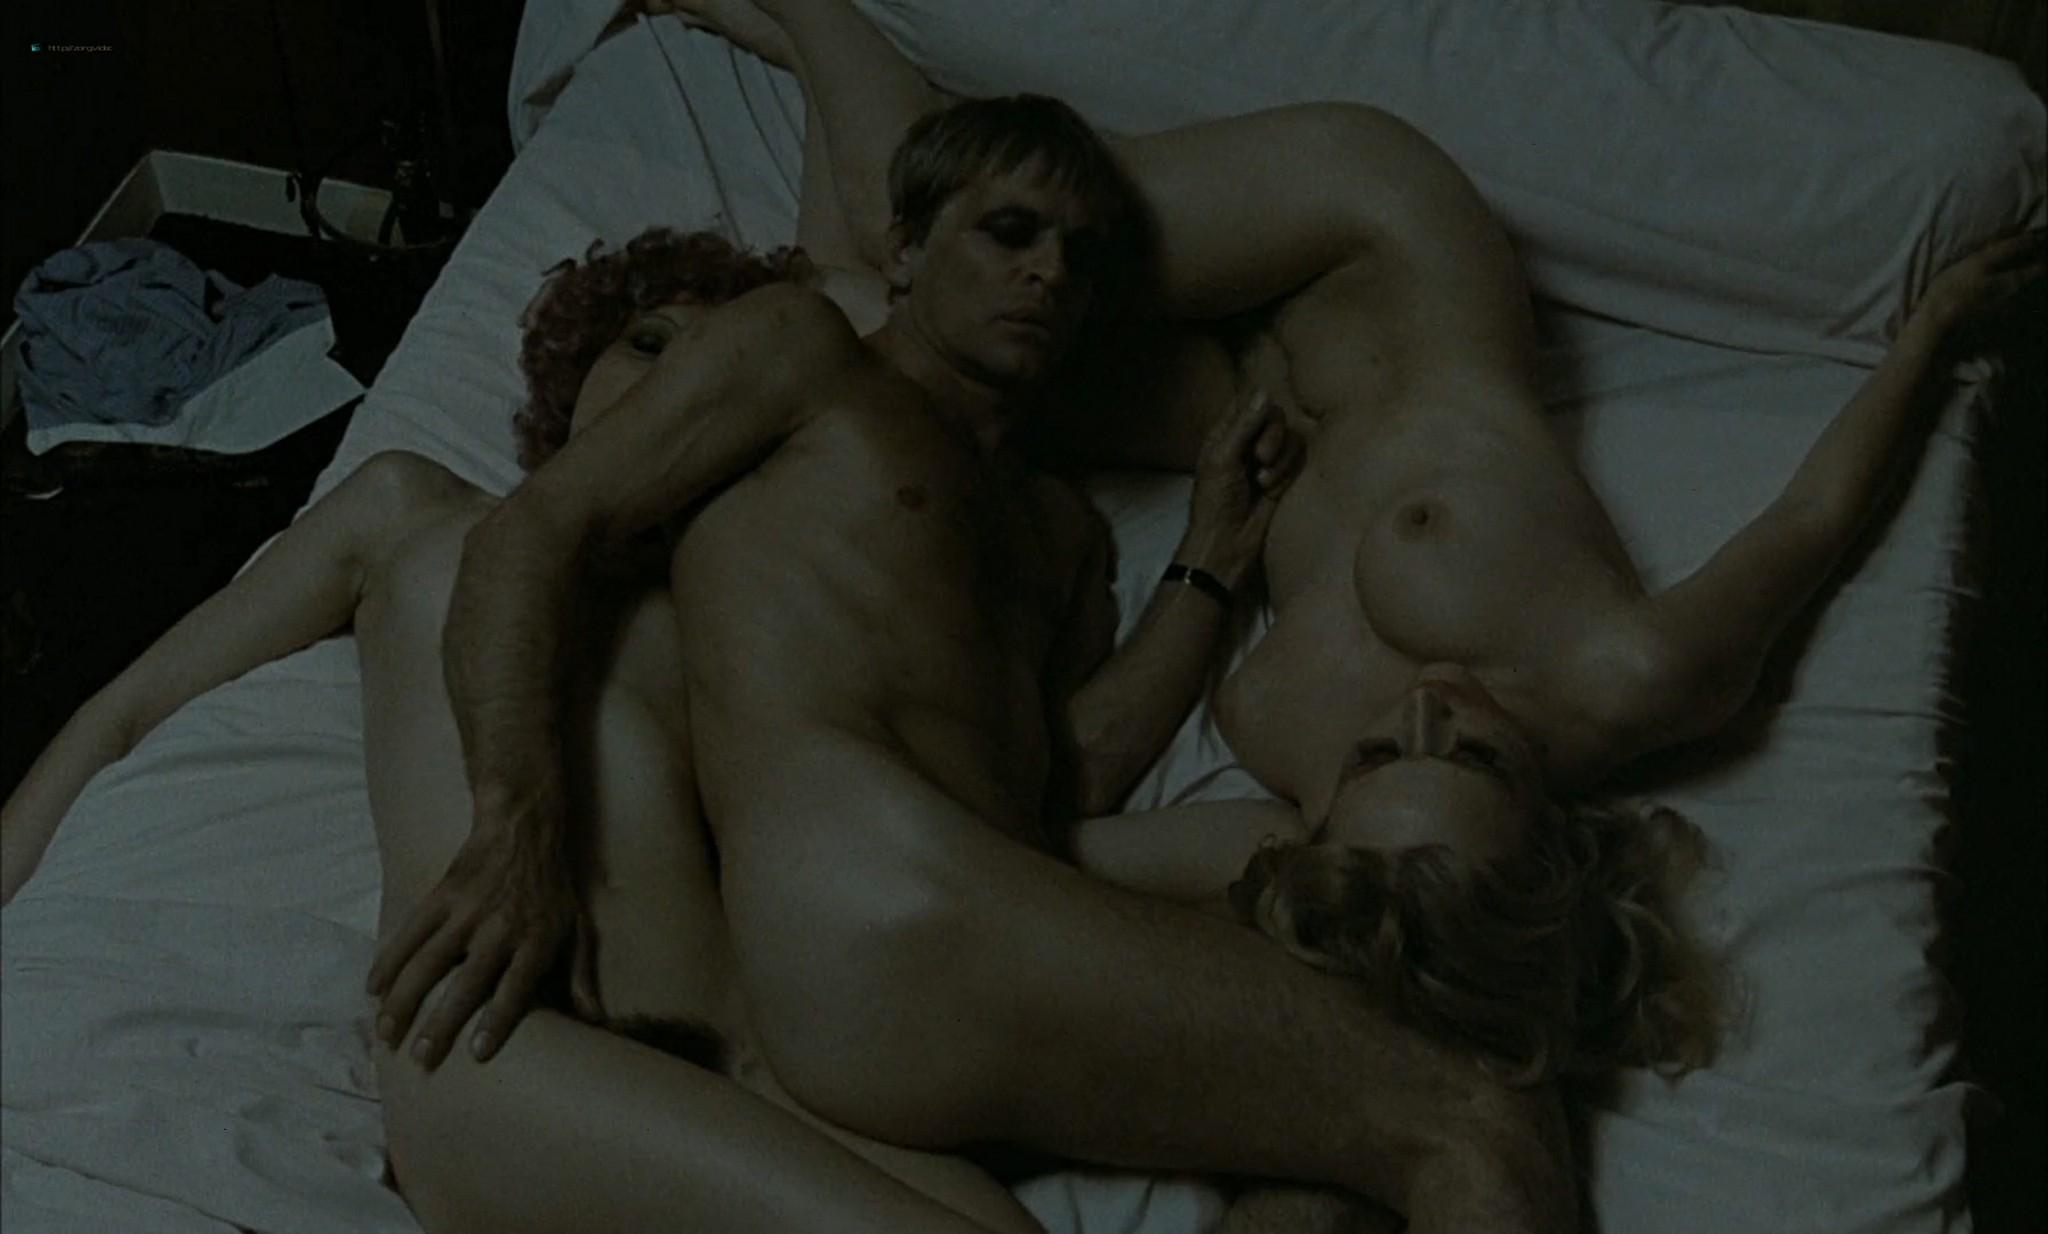 Romy Schneider nude butt Nadia Vasil bush others orgy - L'important c'est d'aimer (FR-1975) HD 1080p BluRay (8)